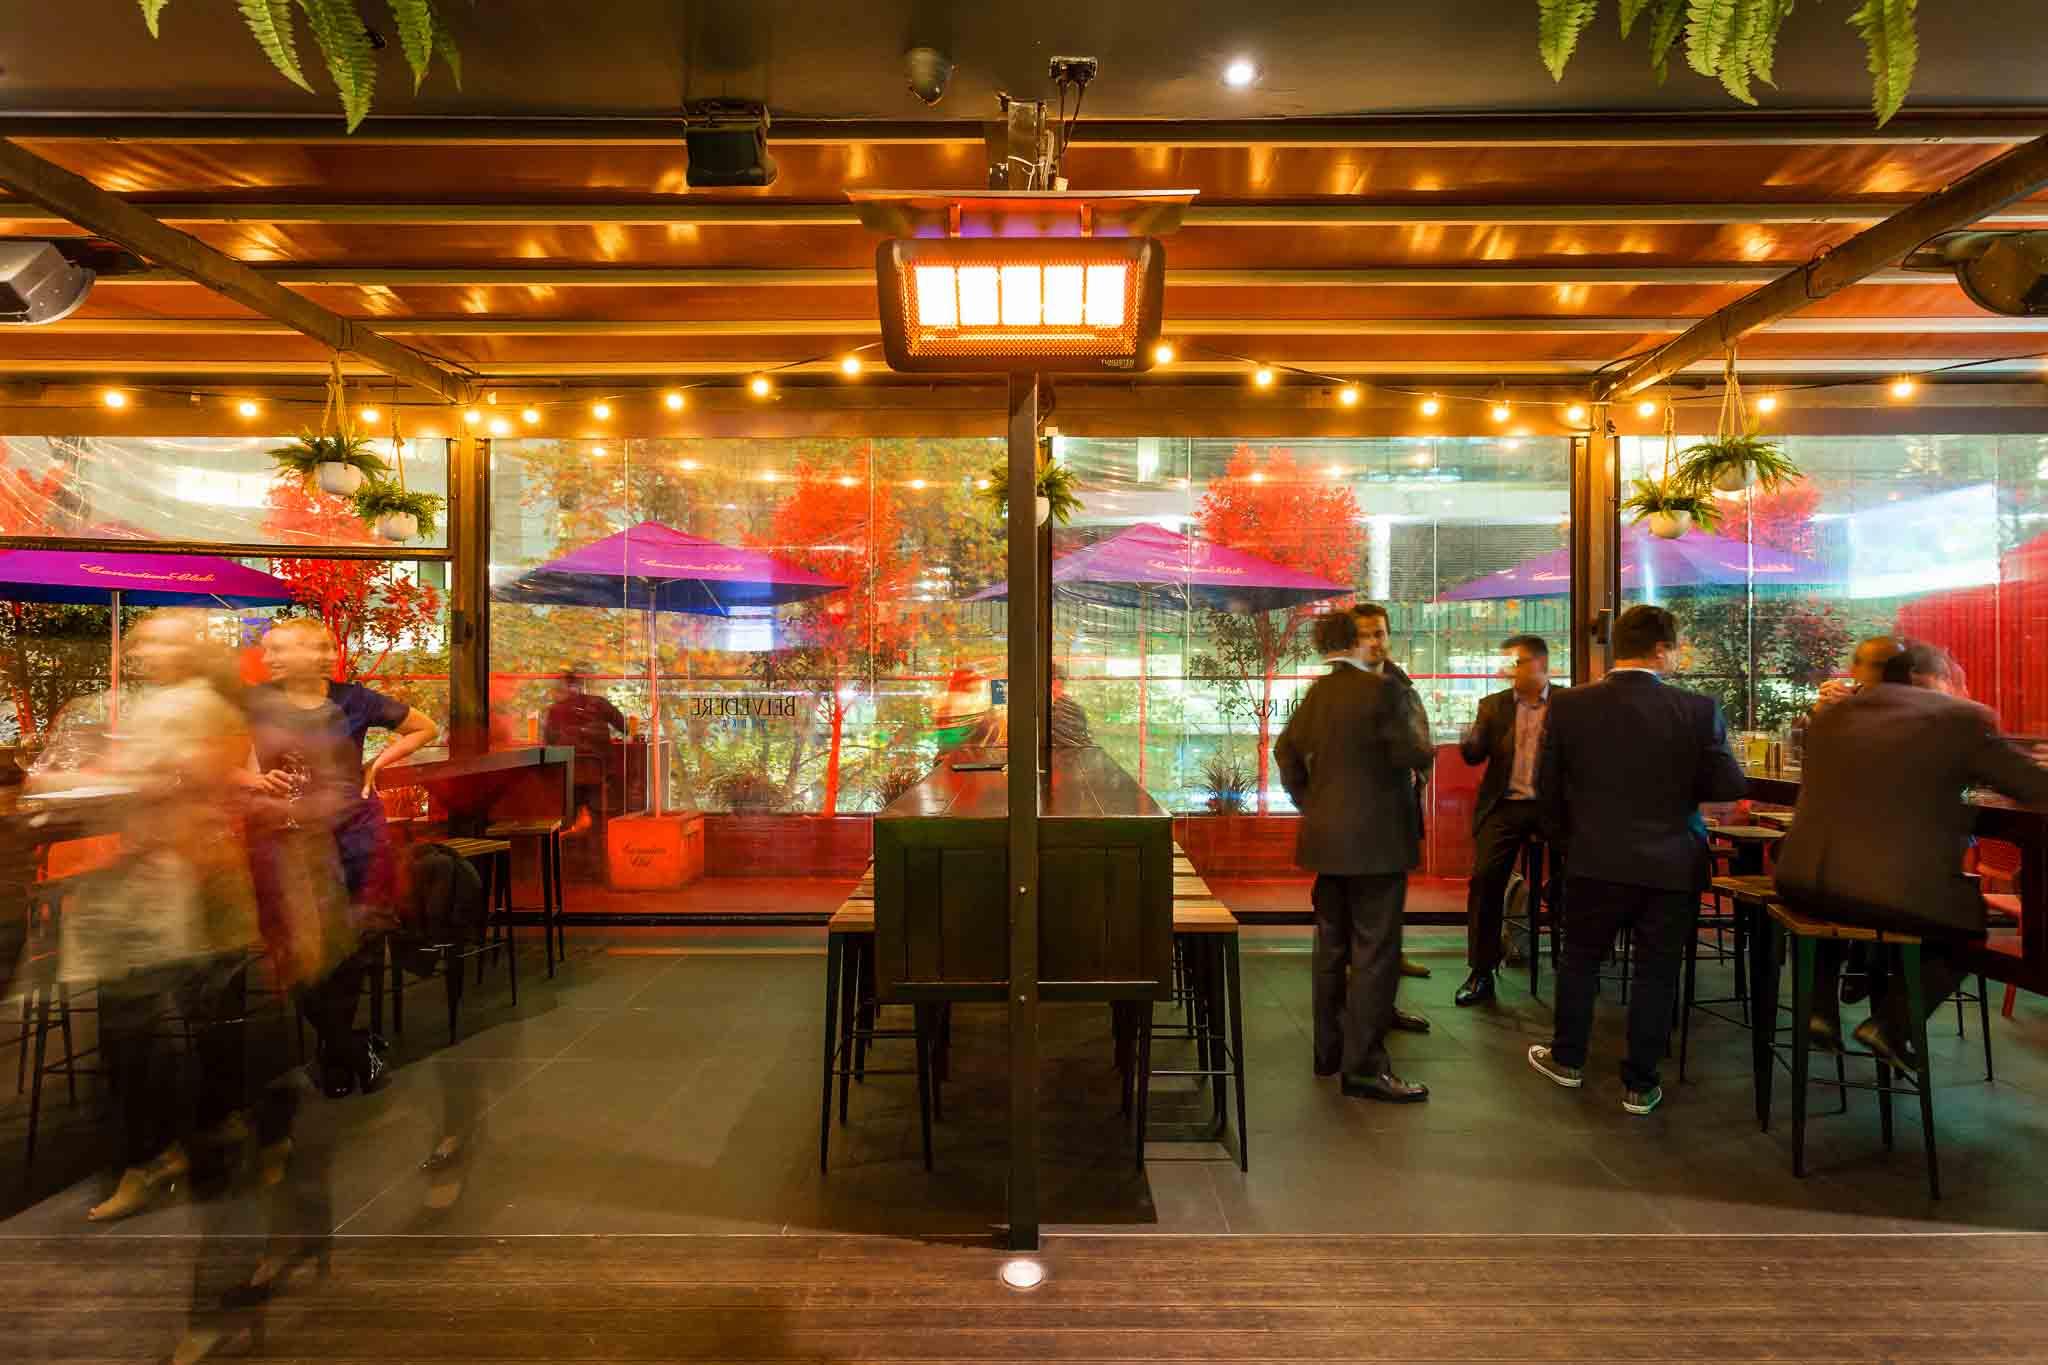 AER Bar – CBD Rooftop Bars